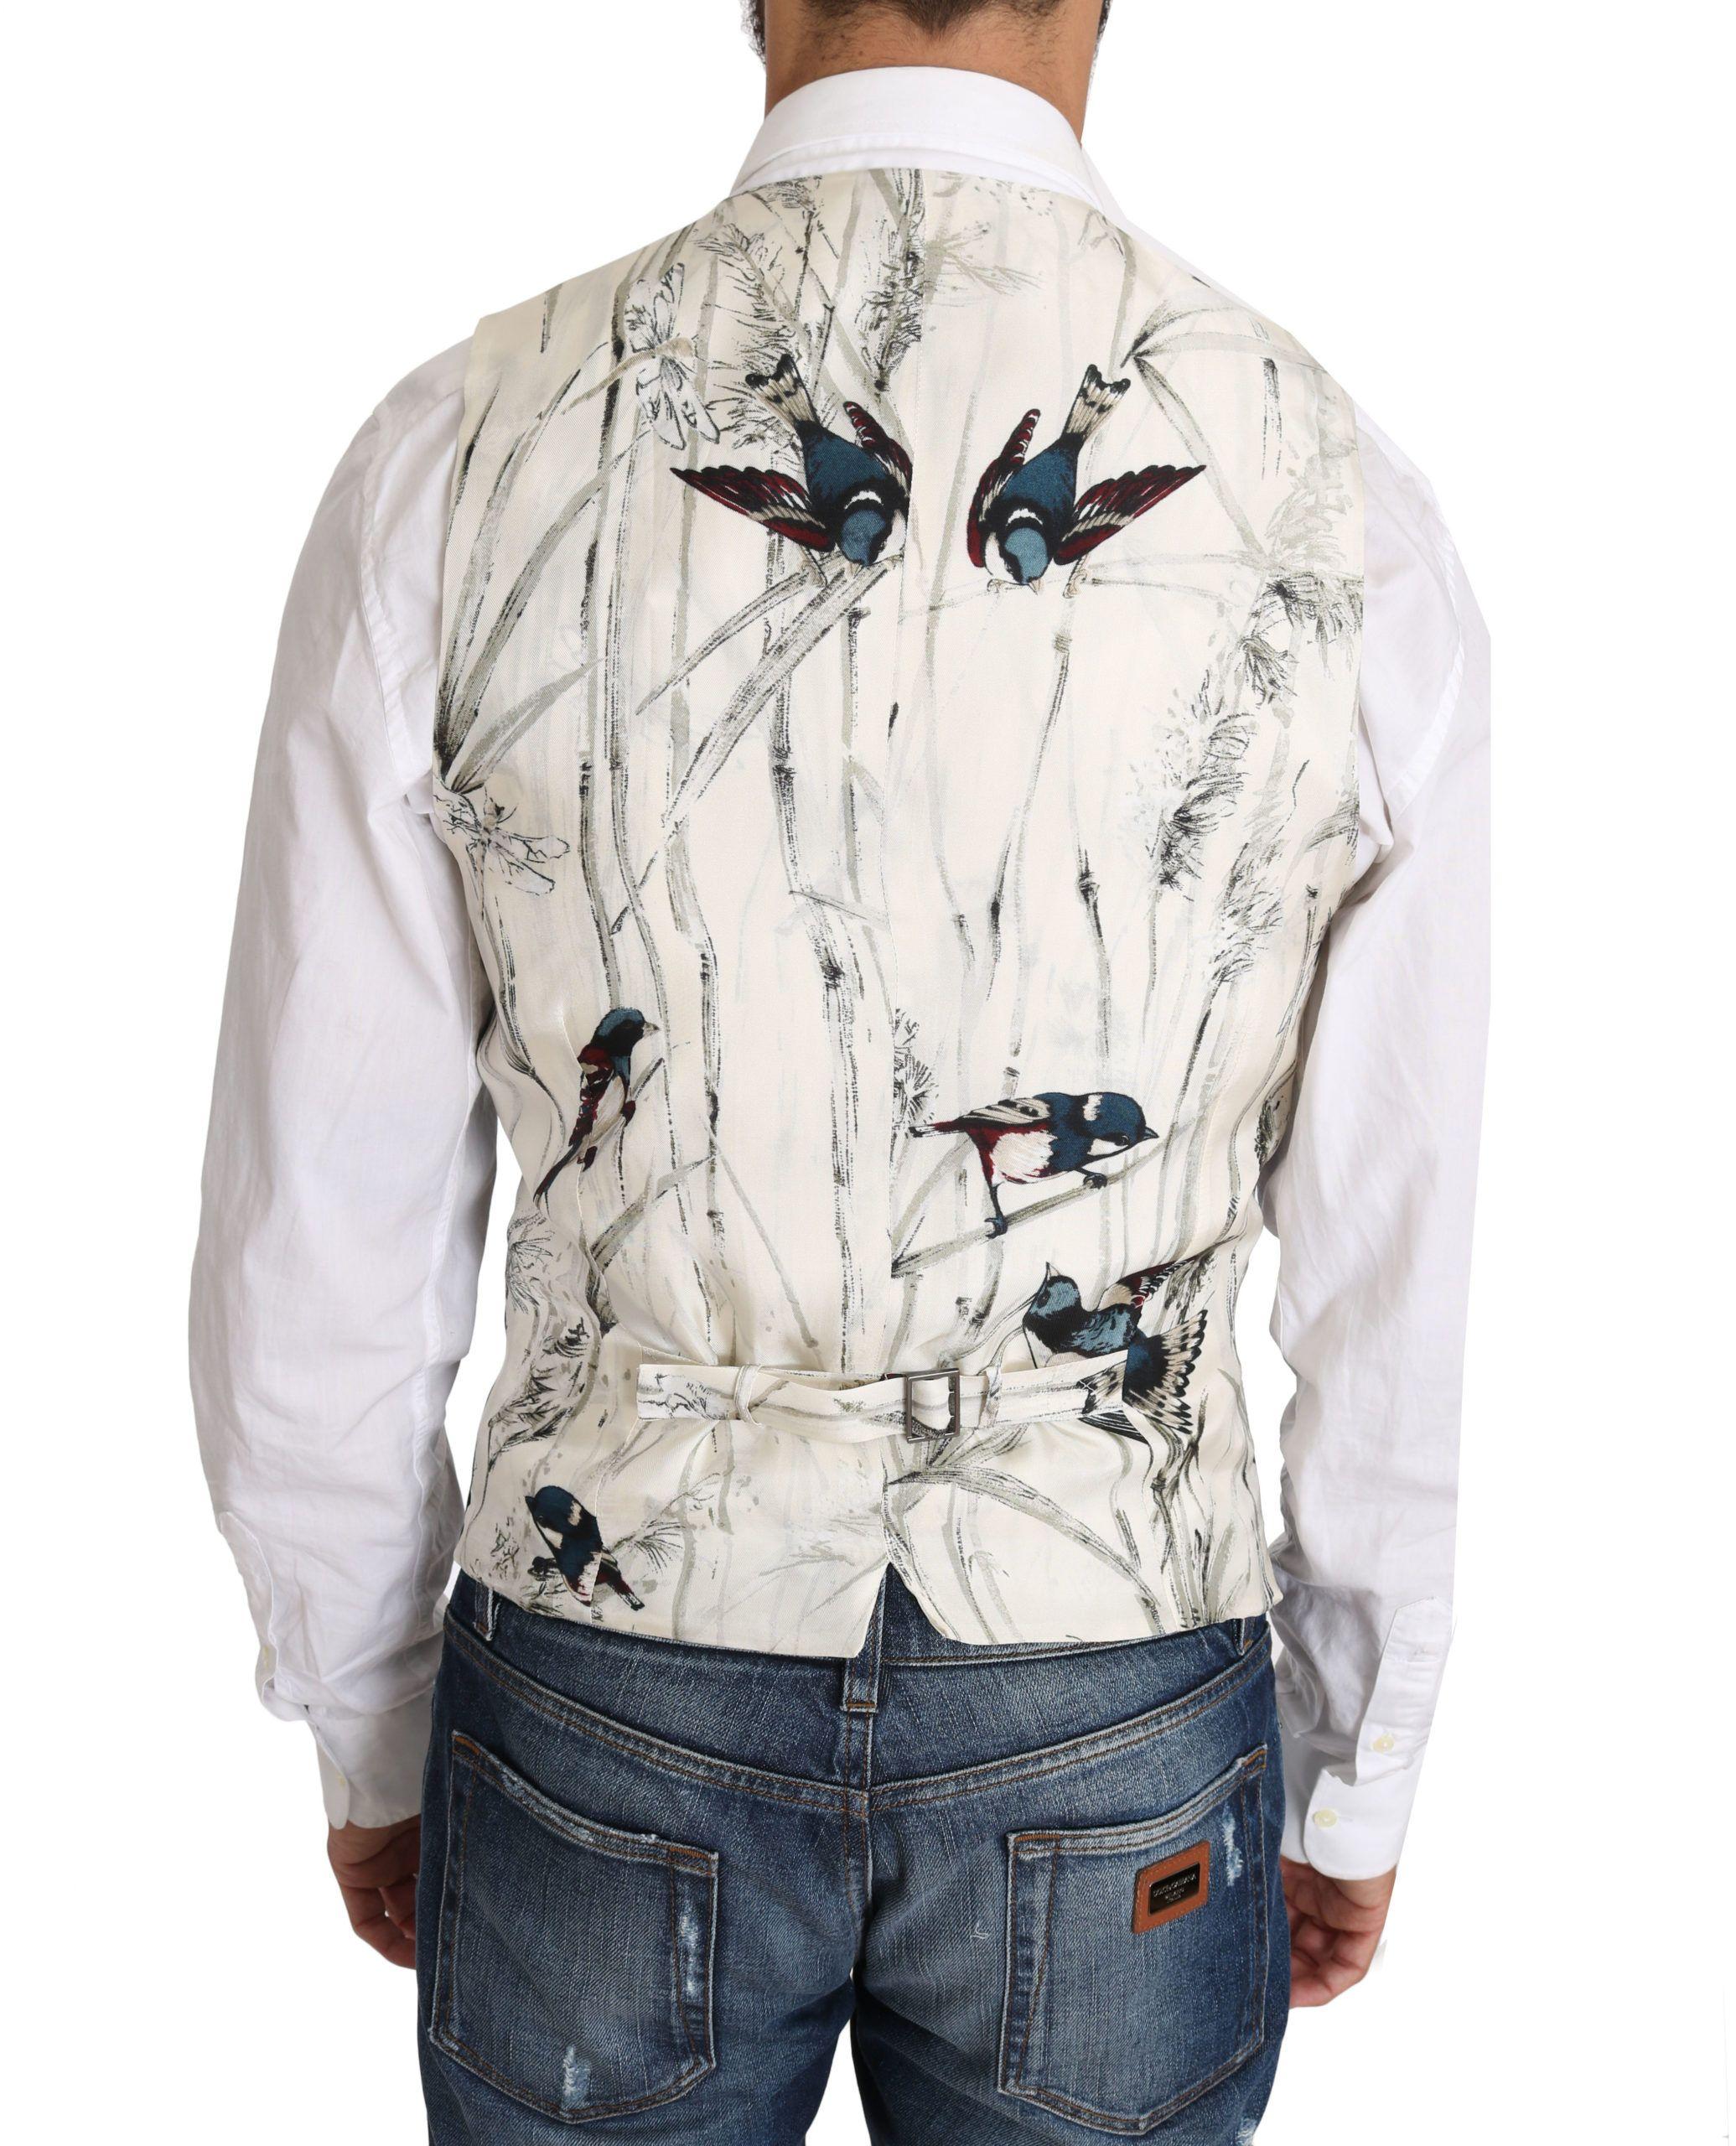 Dolce & Gabbana Black Wool Blend Dress Vest waistcoat